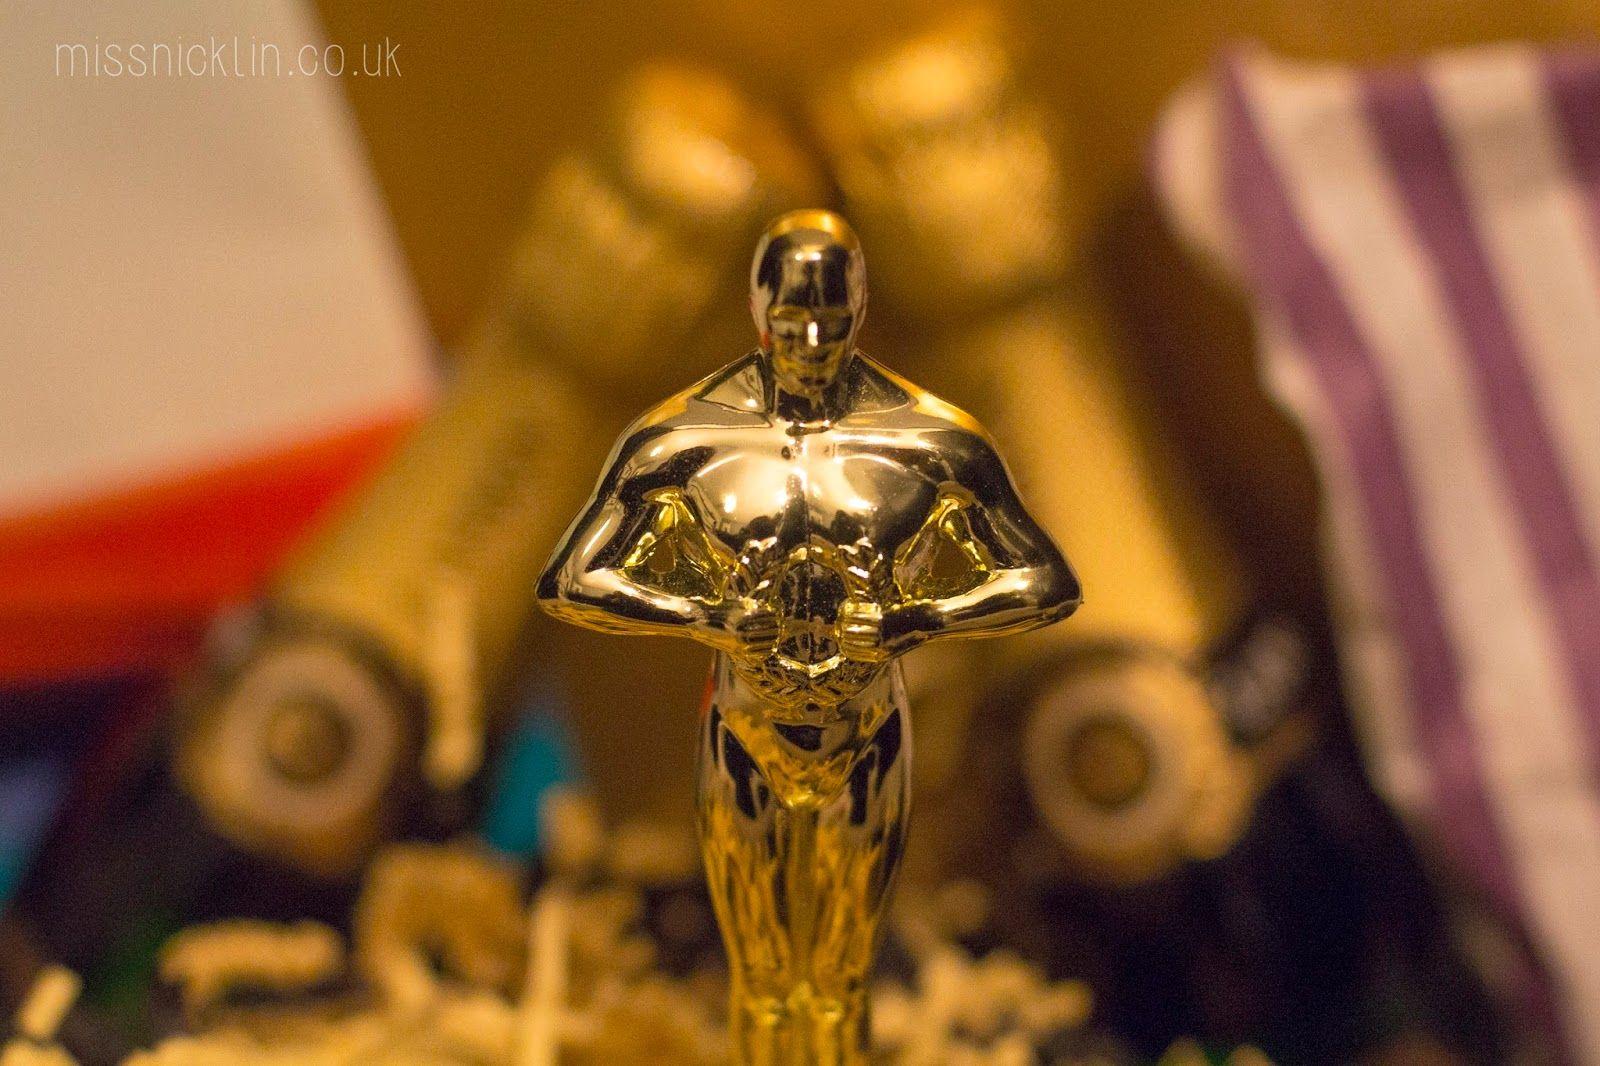 Miss Nicklin | Lifestyle, Events & Food Blog: Play #OscarsBingo with Showcase Cinemas!